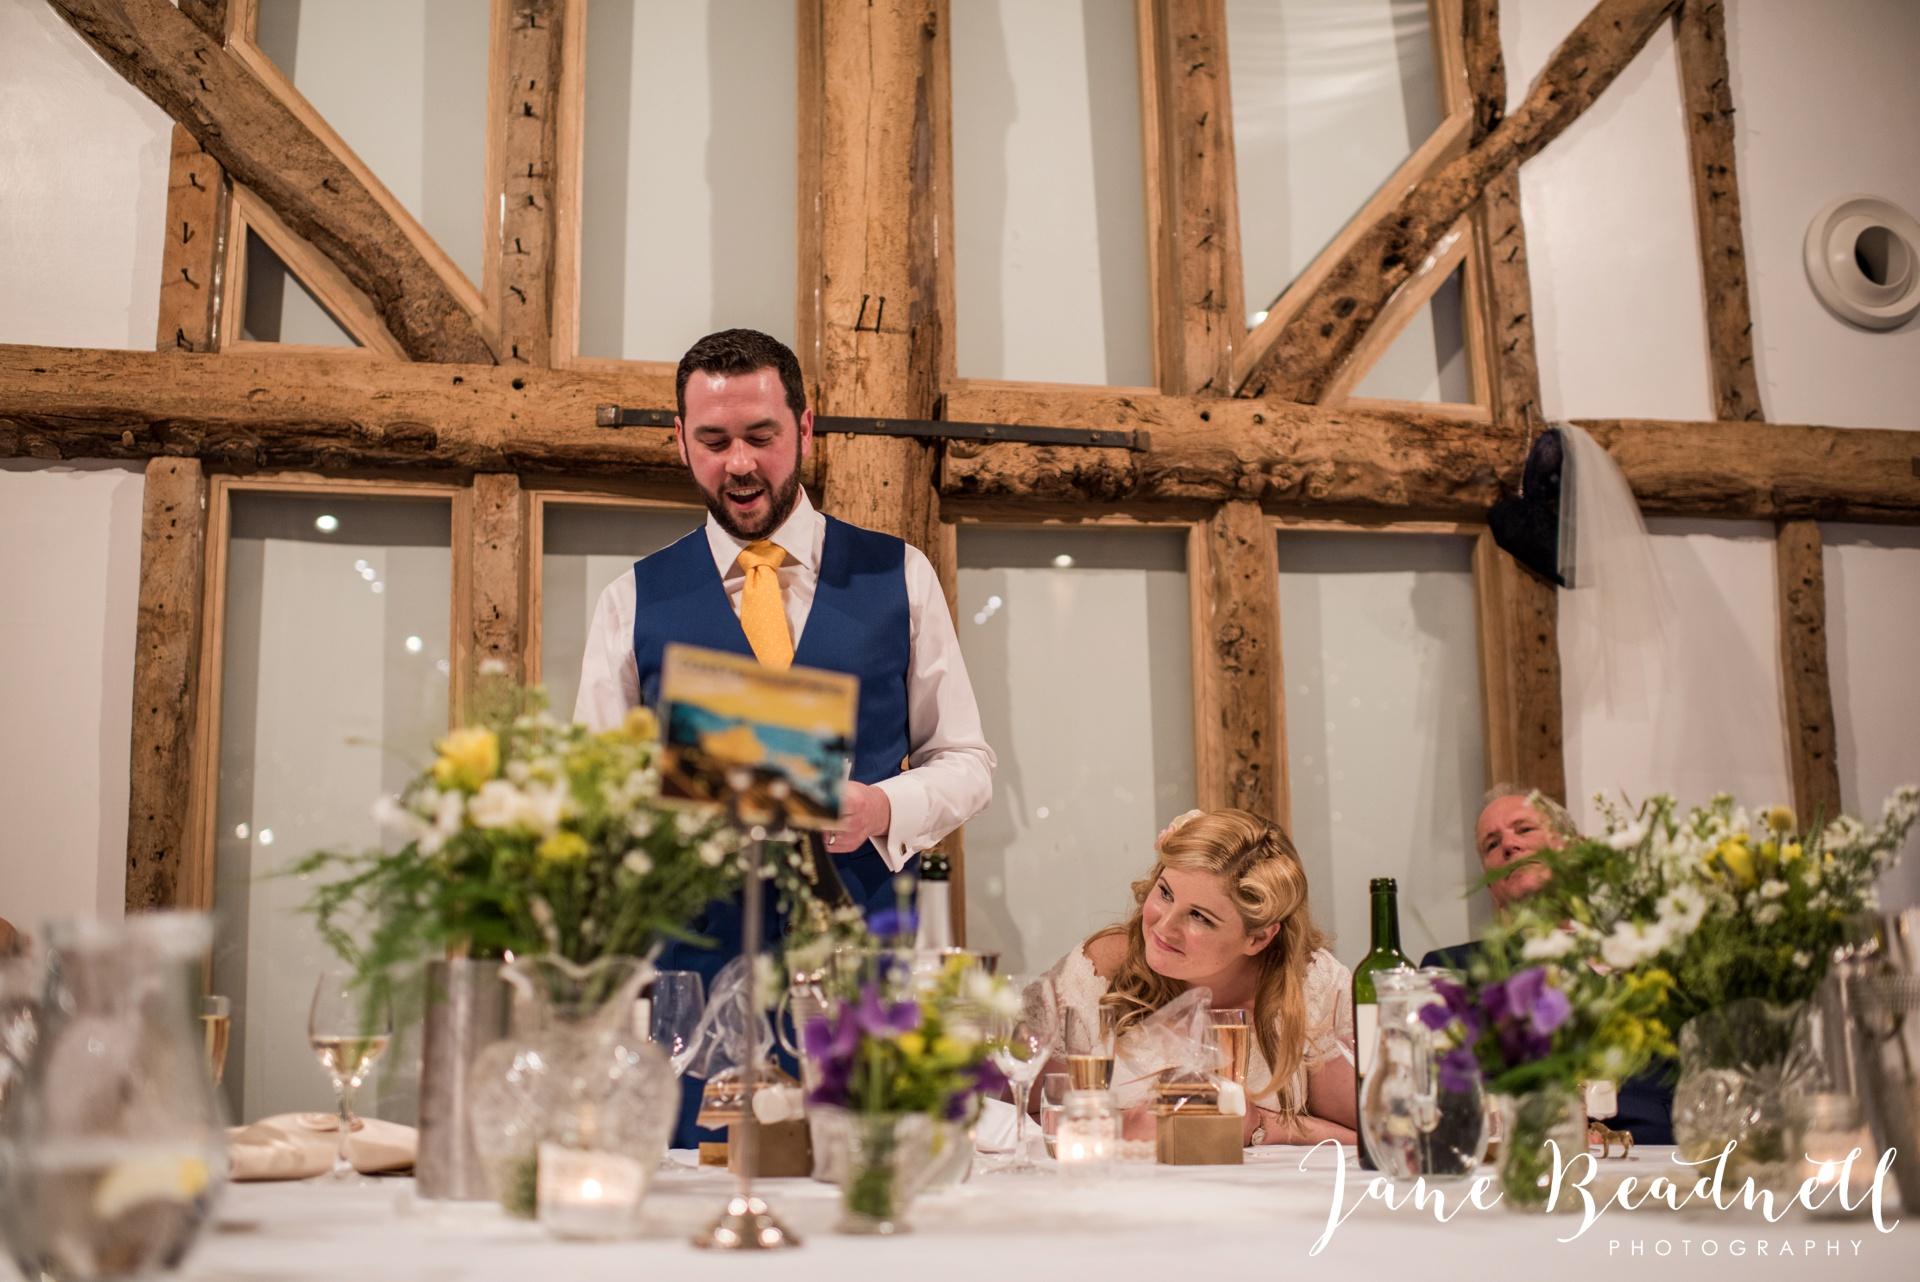 South Farm Wedding photography Hertfordshire by Jane Beadnell Photography fine art wedding photographer_0198